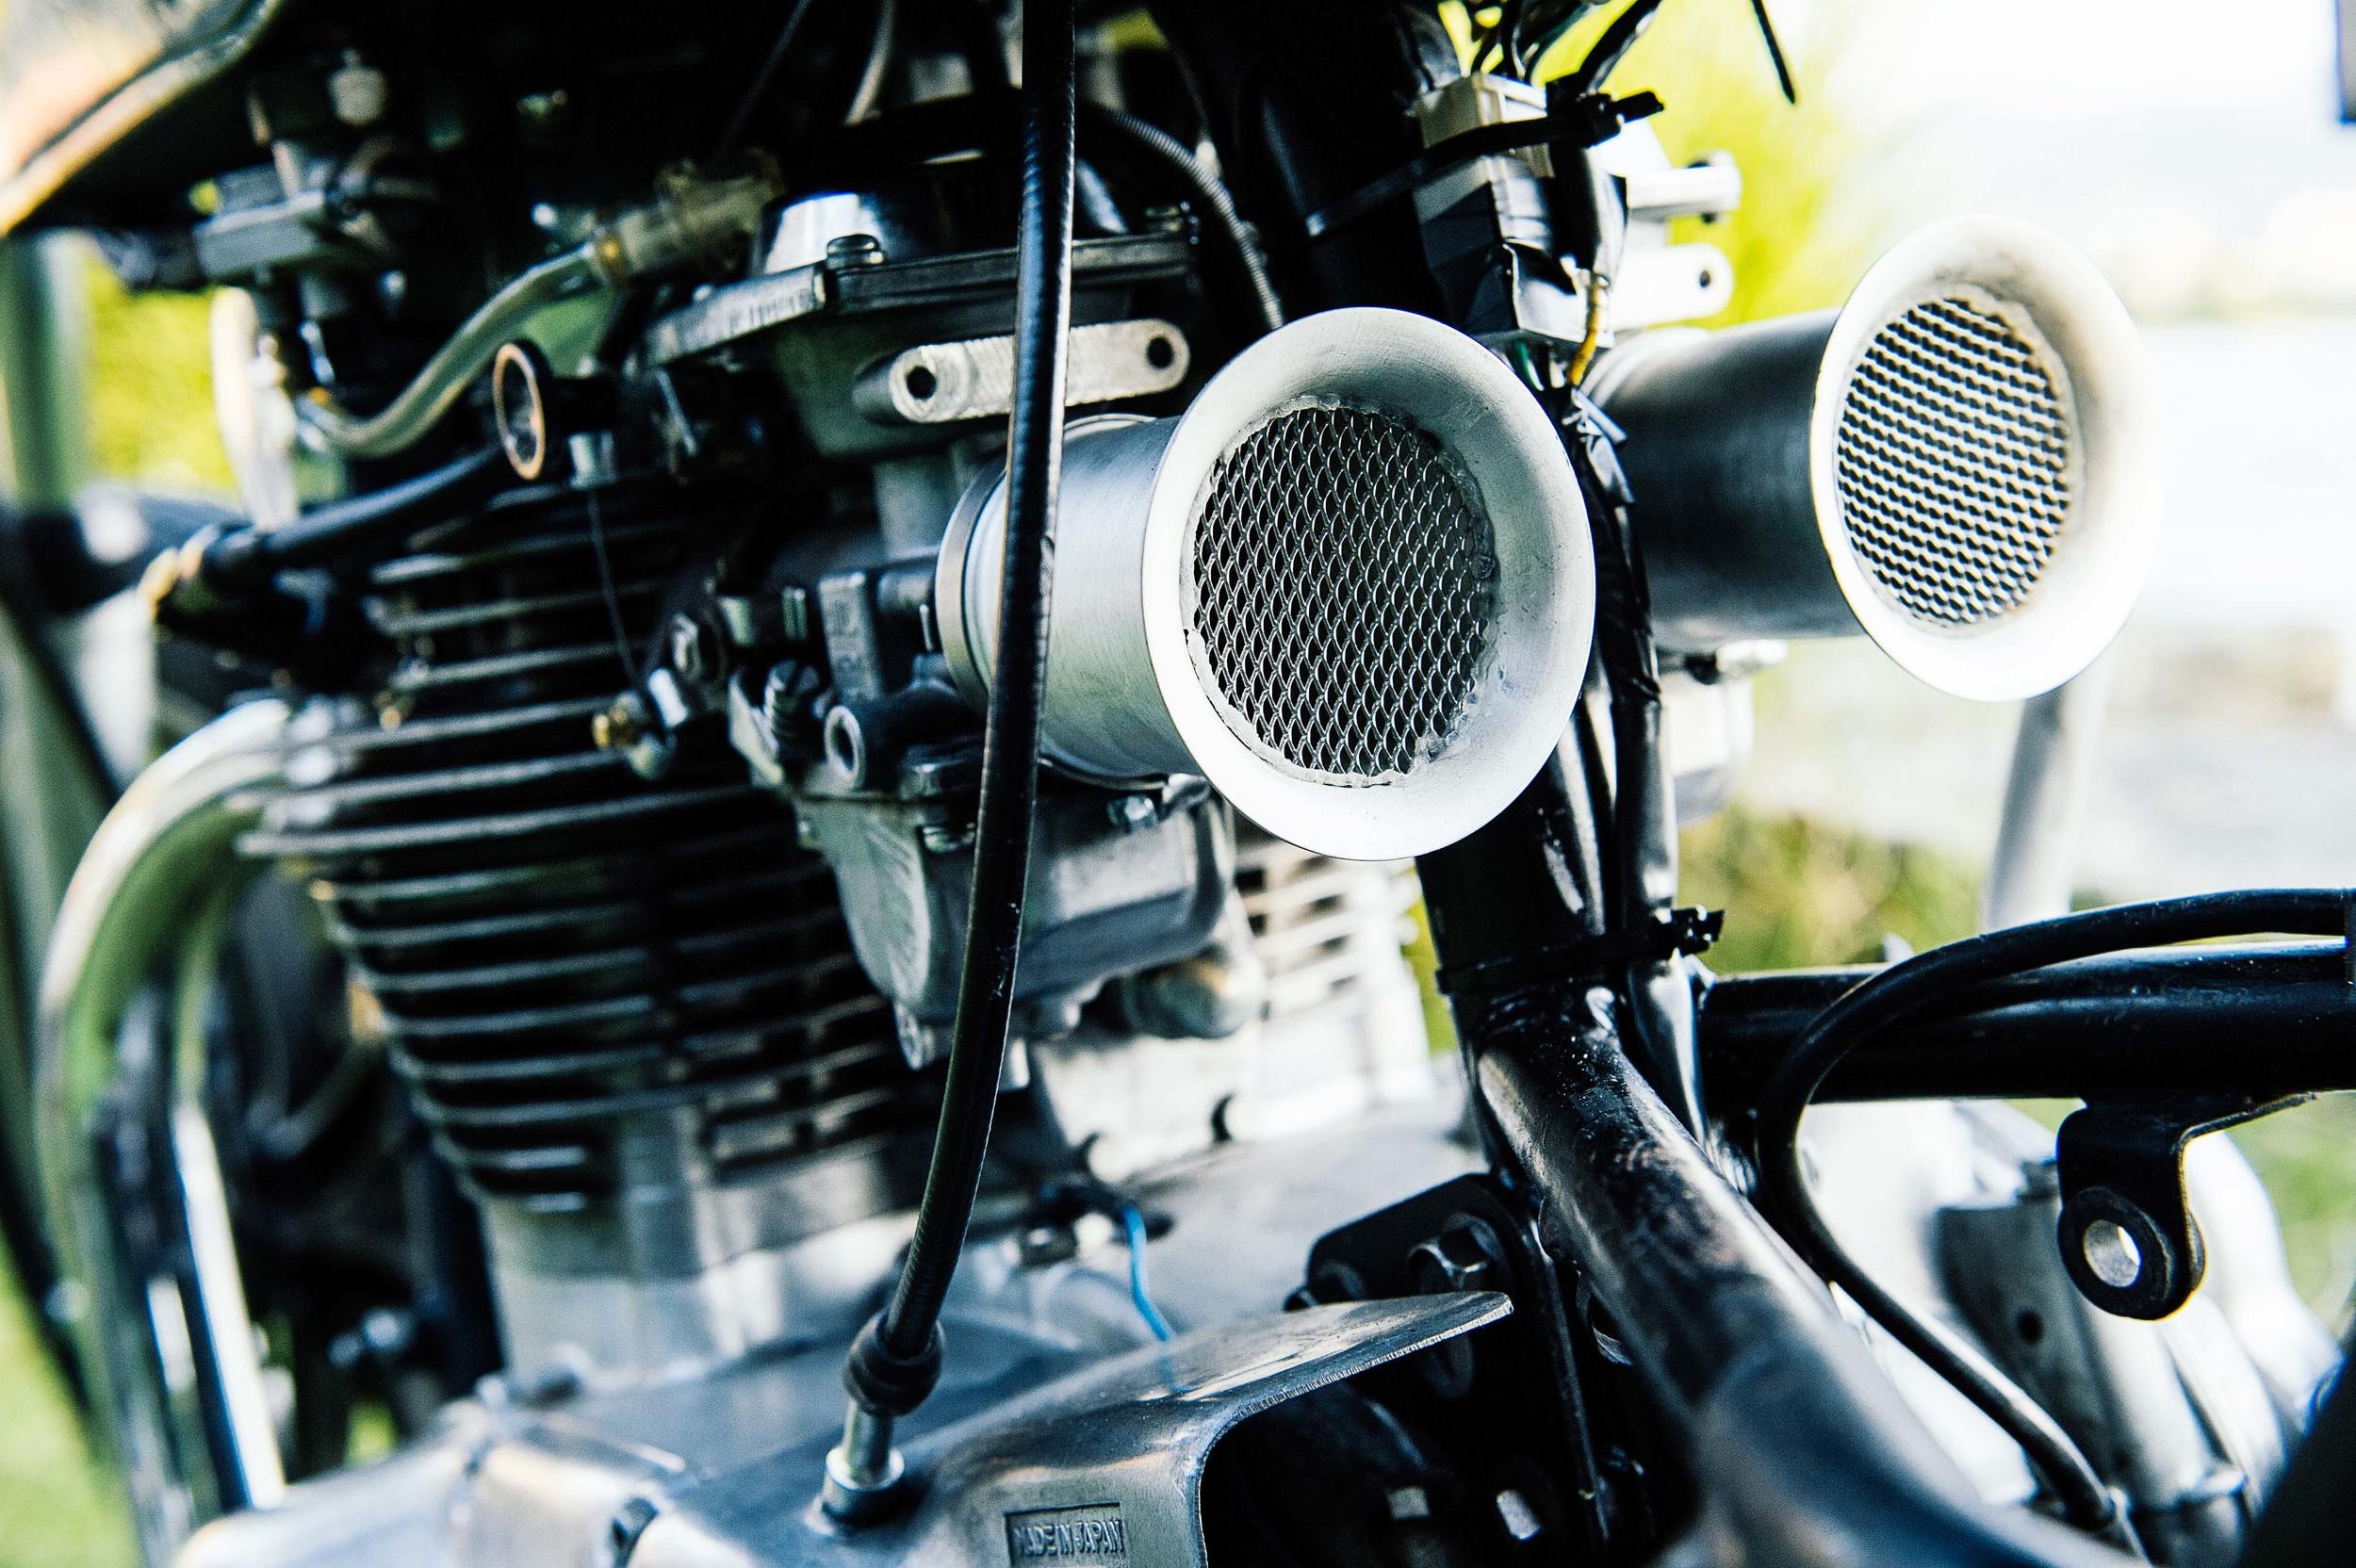 youngguns xs650 bylorenzrichard com 5043 jpg [ 2500 x 1664 Pixel ]